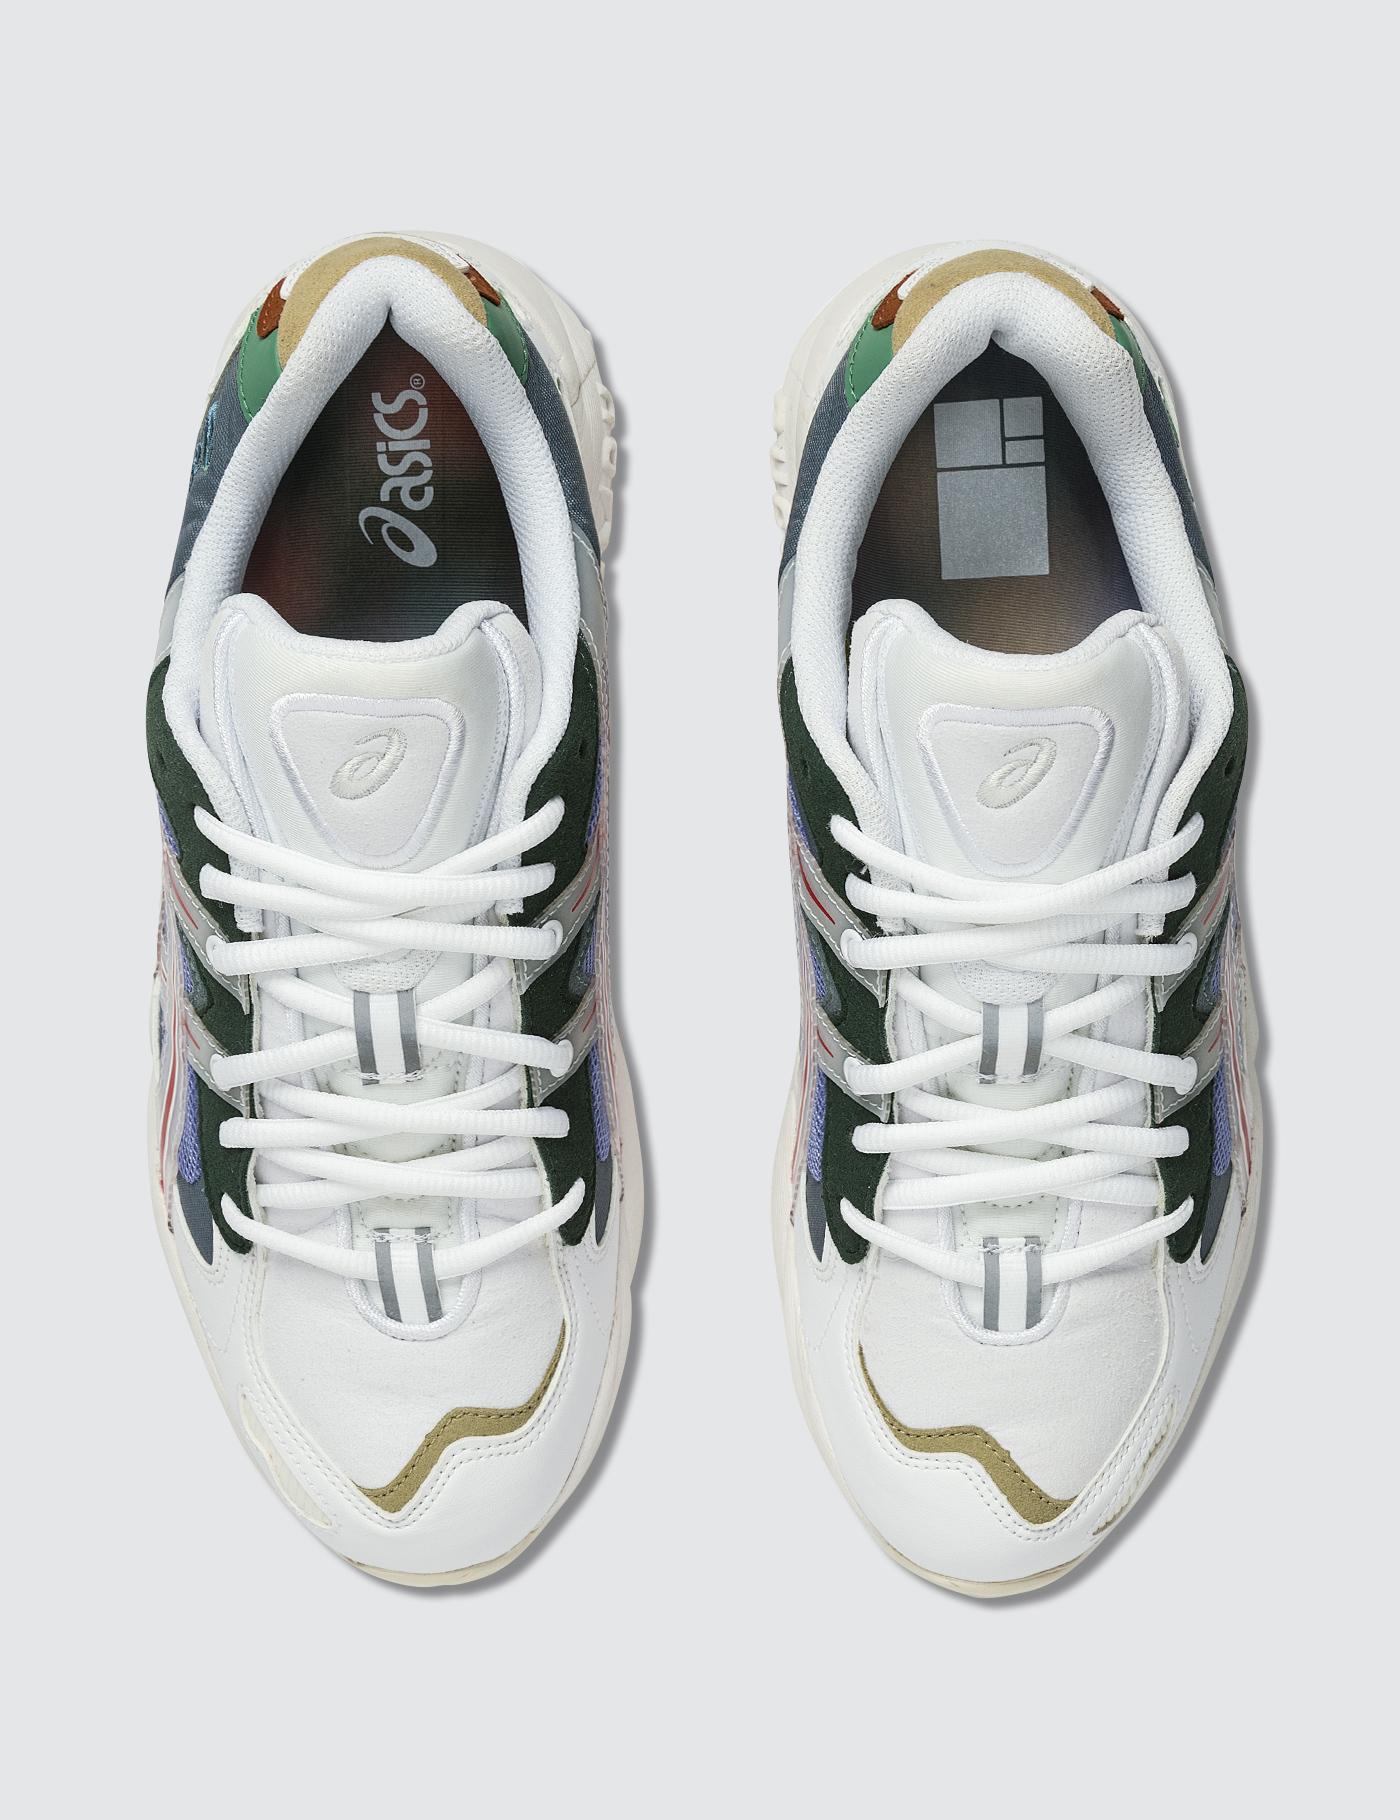 Shoes_1_5.jpg